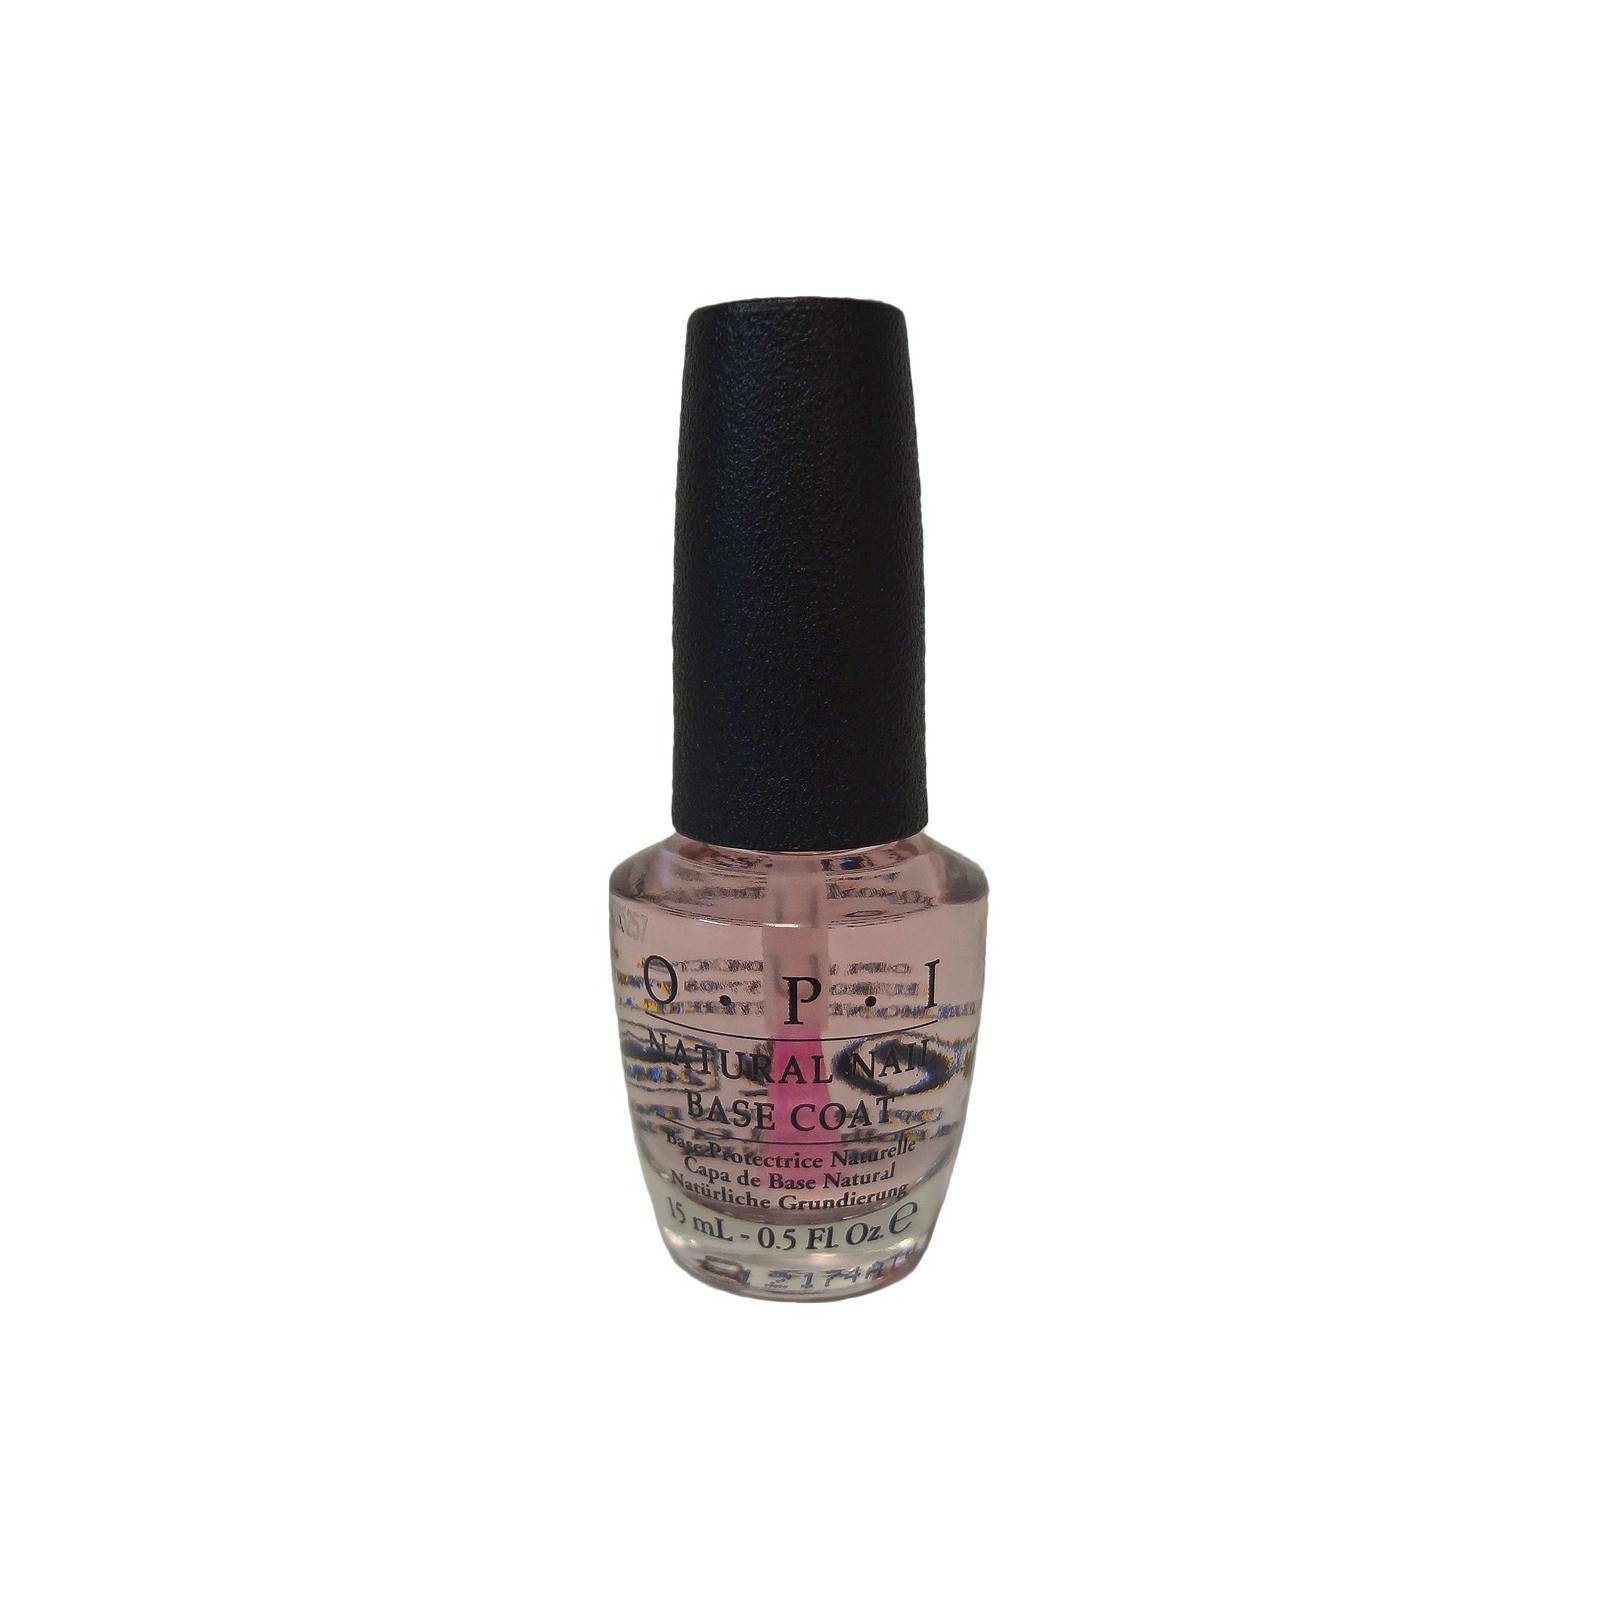 OPI Natural Nail Base Coat, 0.5-Fluid Ounce\